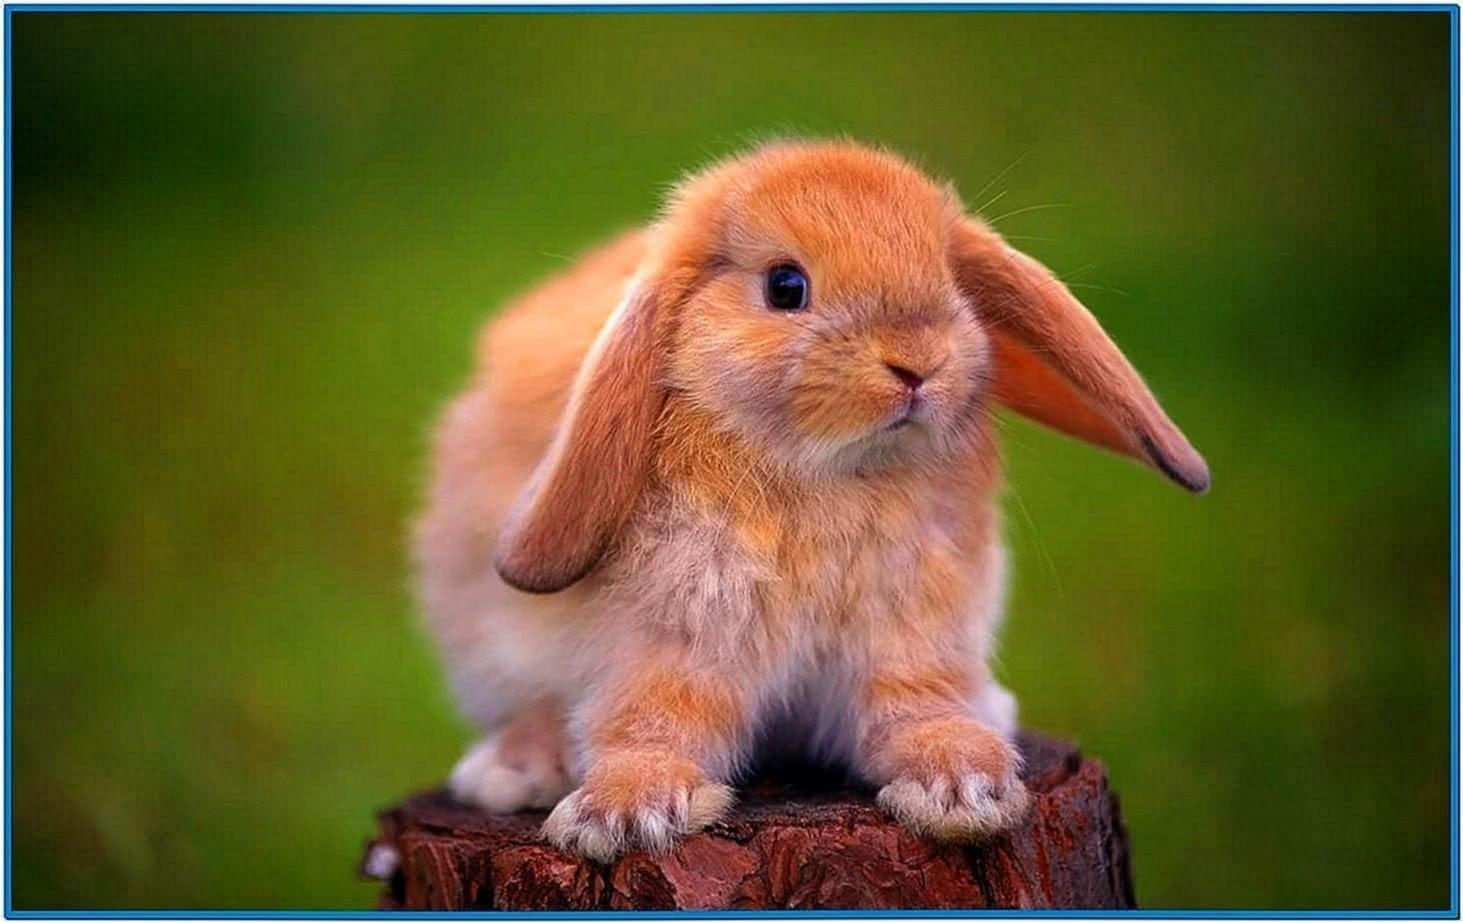 Screensaver Year of The Rabbit